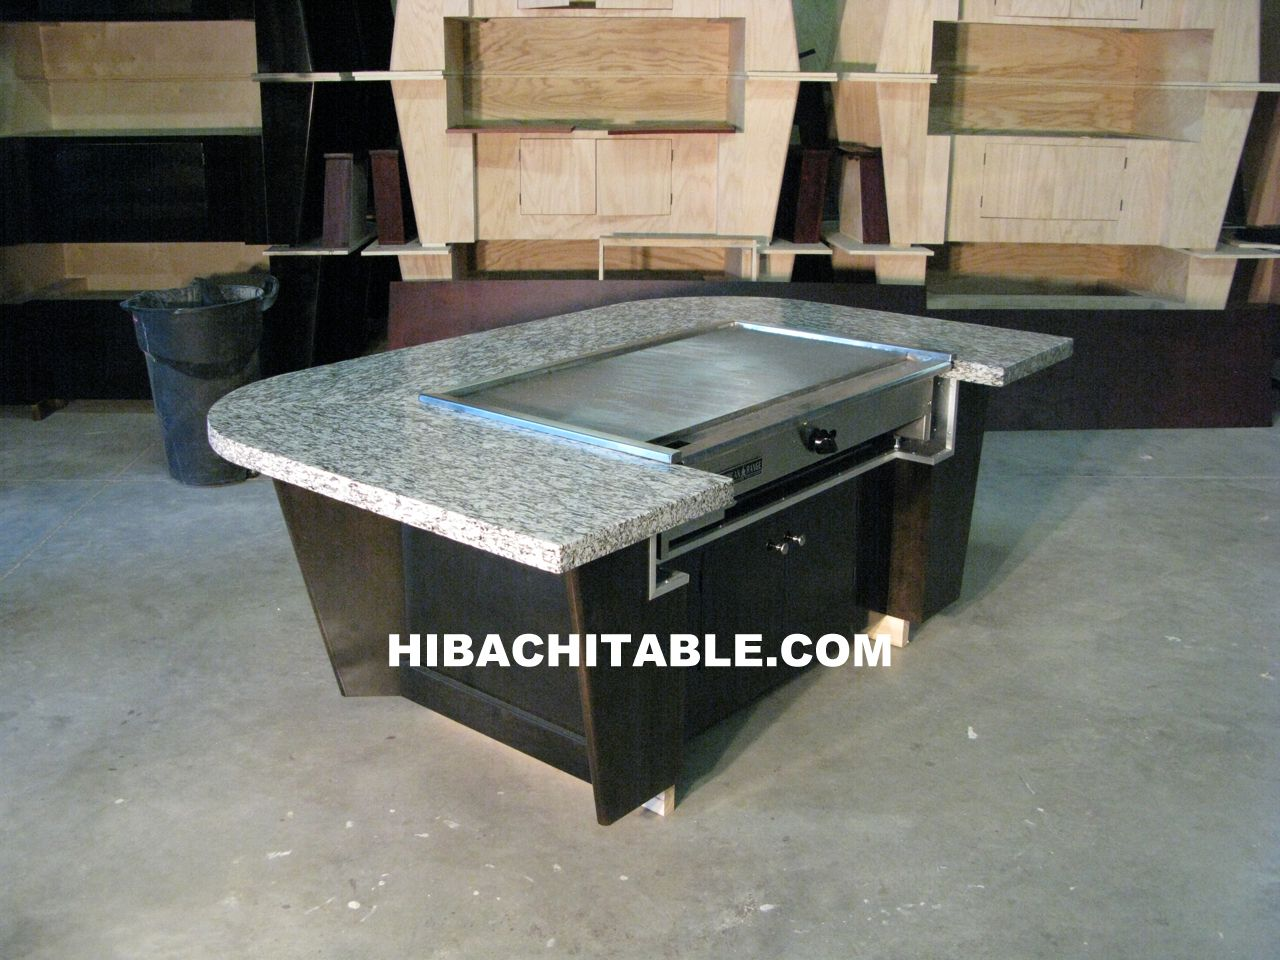 Hibachi Grills For The Home Gallery Hibachi Table Teppanyaki